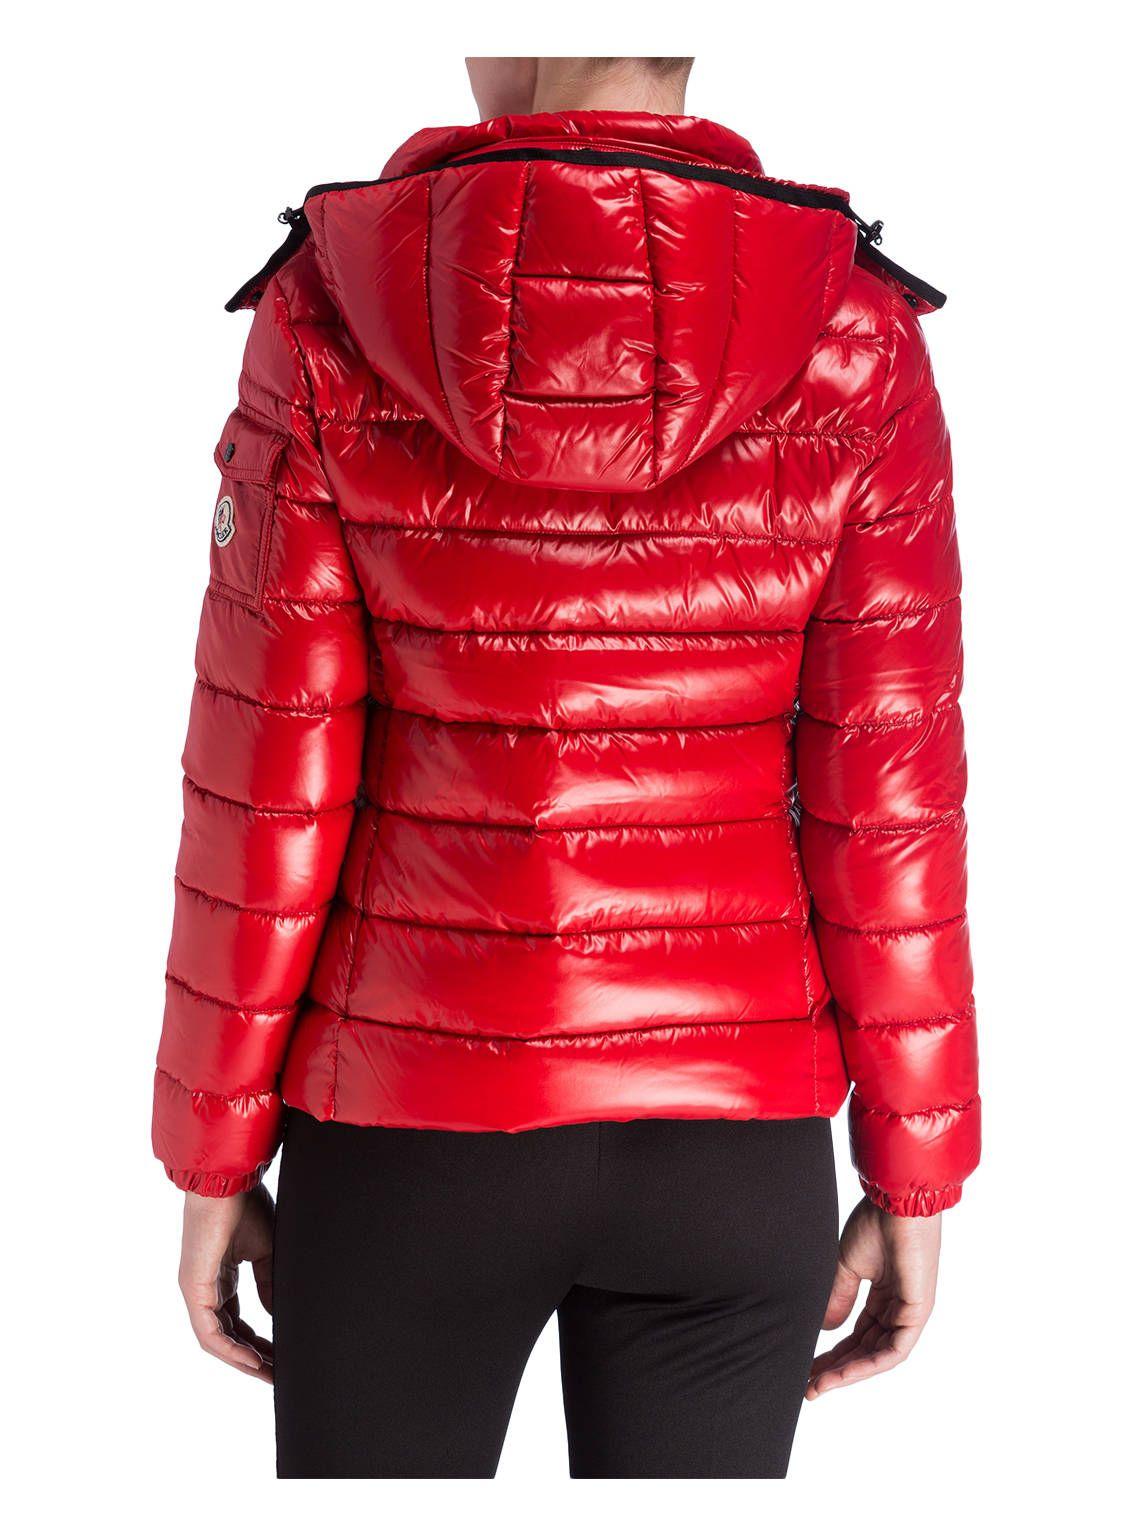 Daunenjacke BADY   Untuvanailon   Pinterest   Jackets, Coat und Moncler 0e0cc538e3